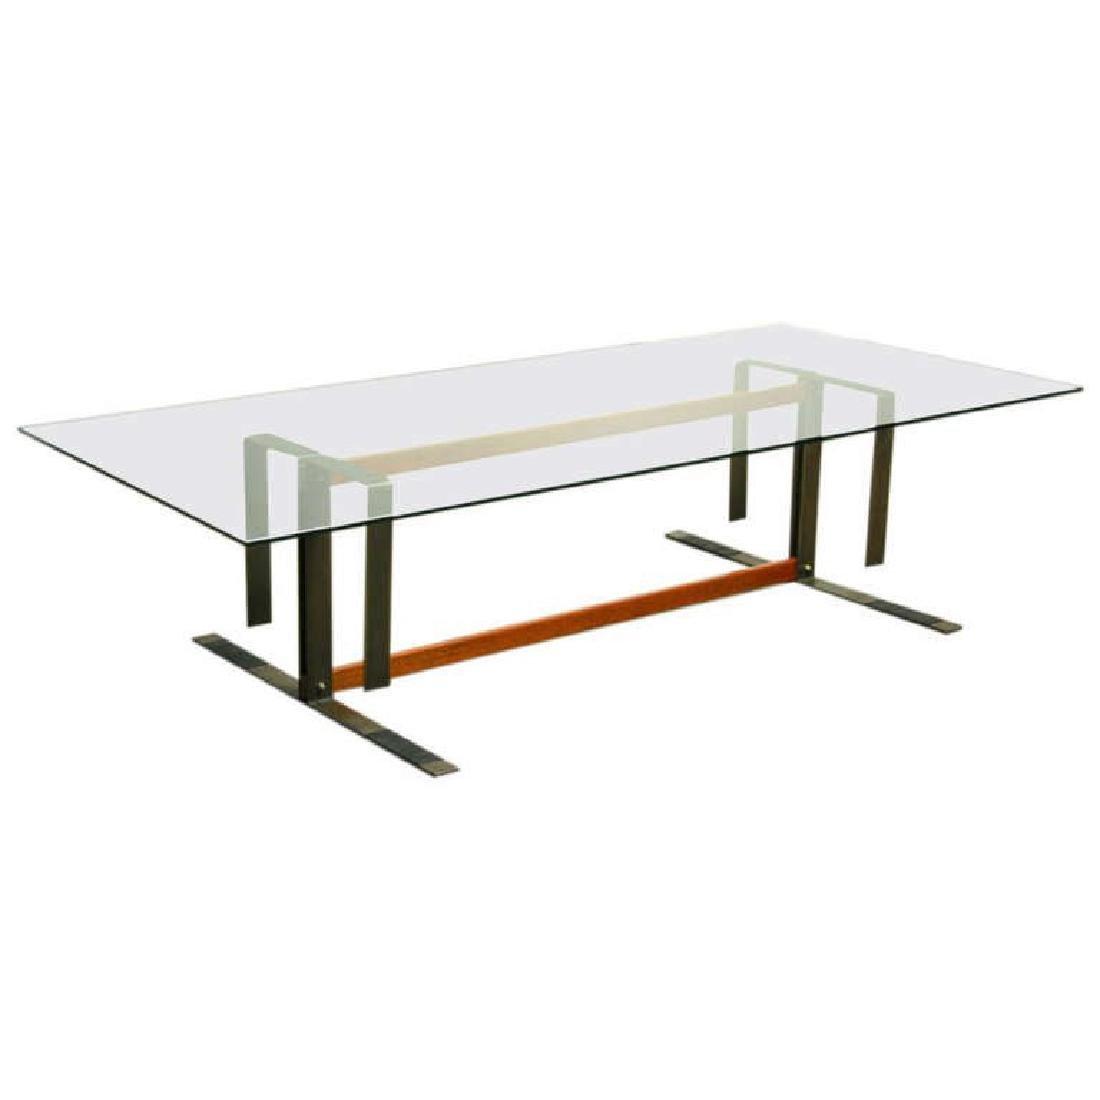 Bronze and Ipe Wood Coffee Table